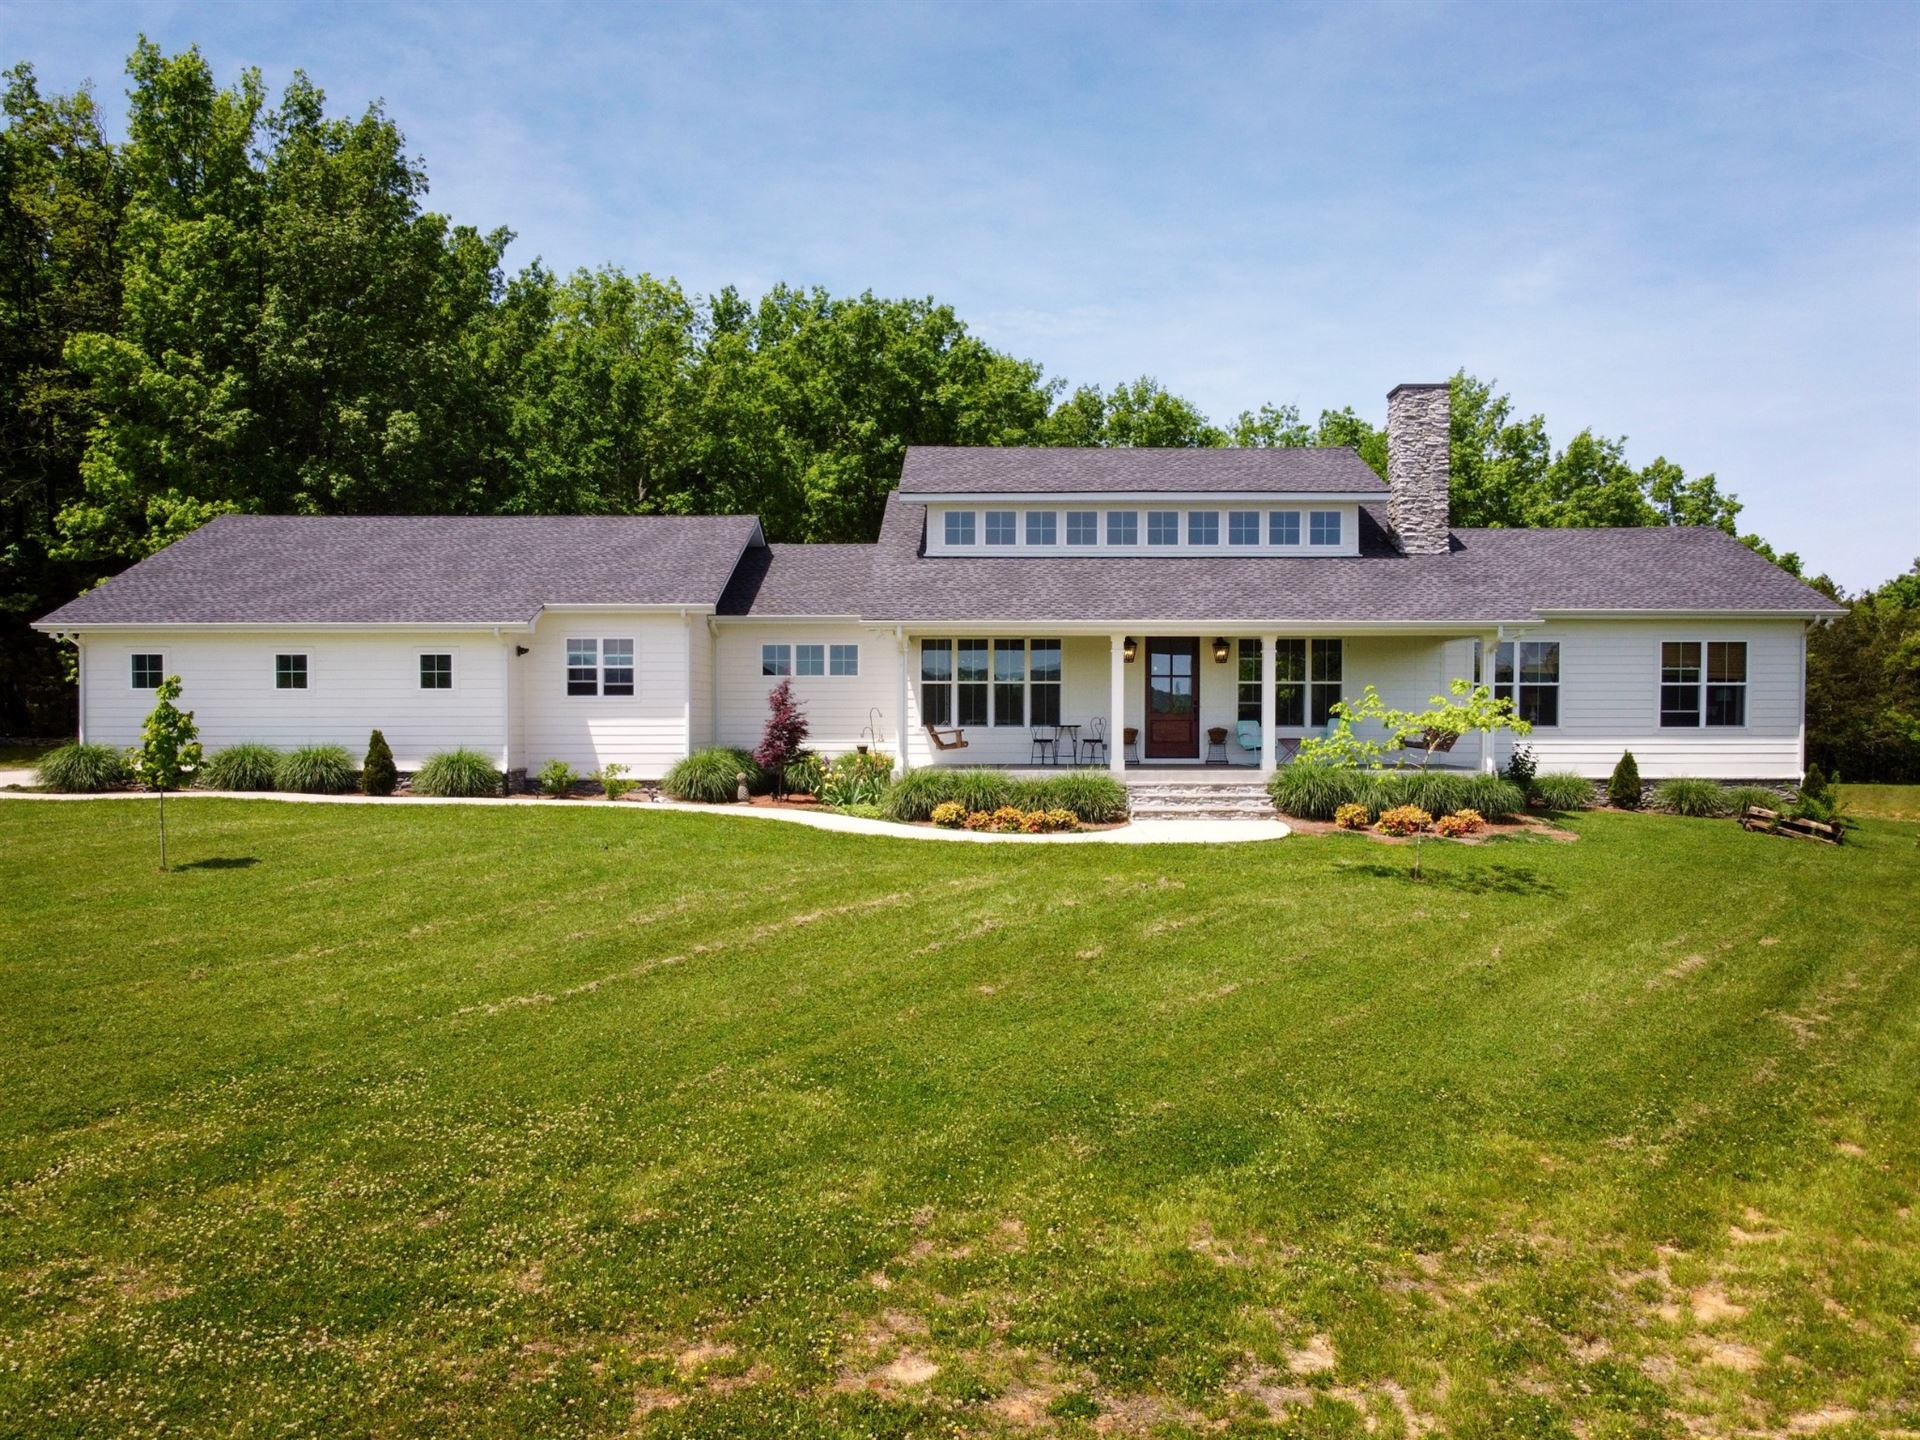 6400 Christiana Hoovers Gap Rd, Christiana, TN 37037 - MLS#: 2261474